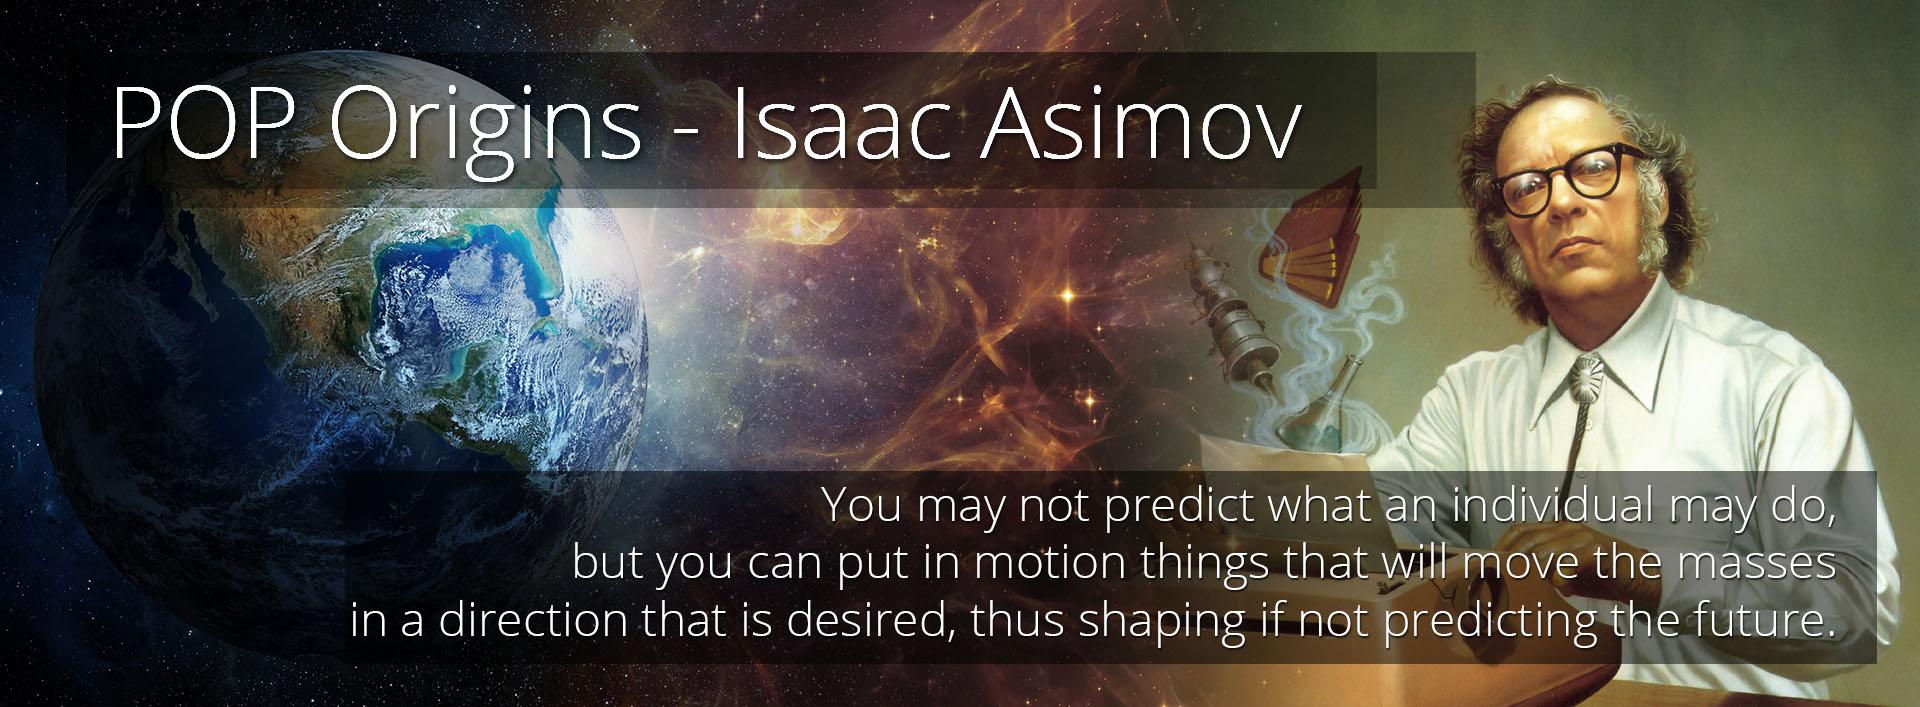 POP Origins - Isaac Asimov